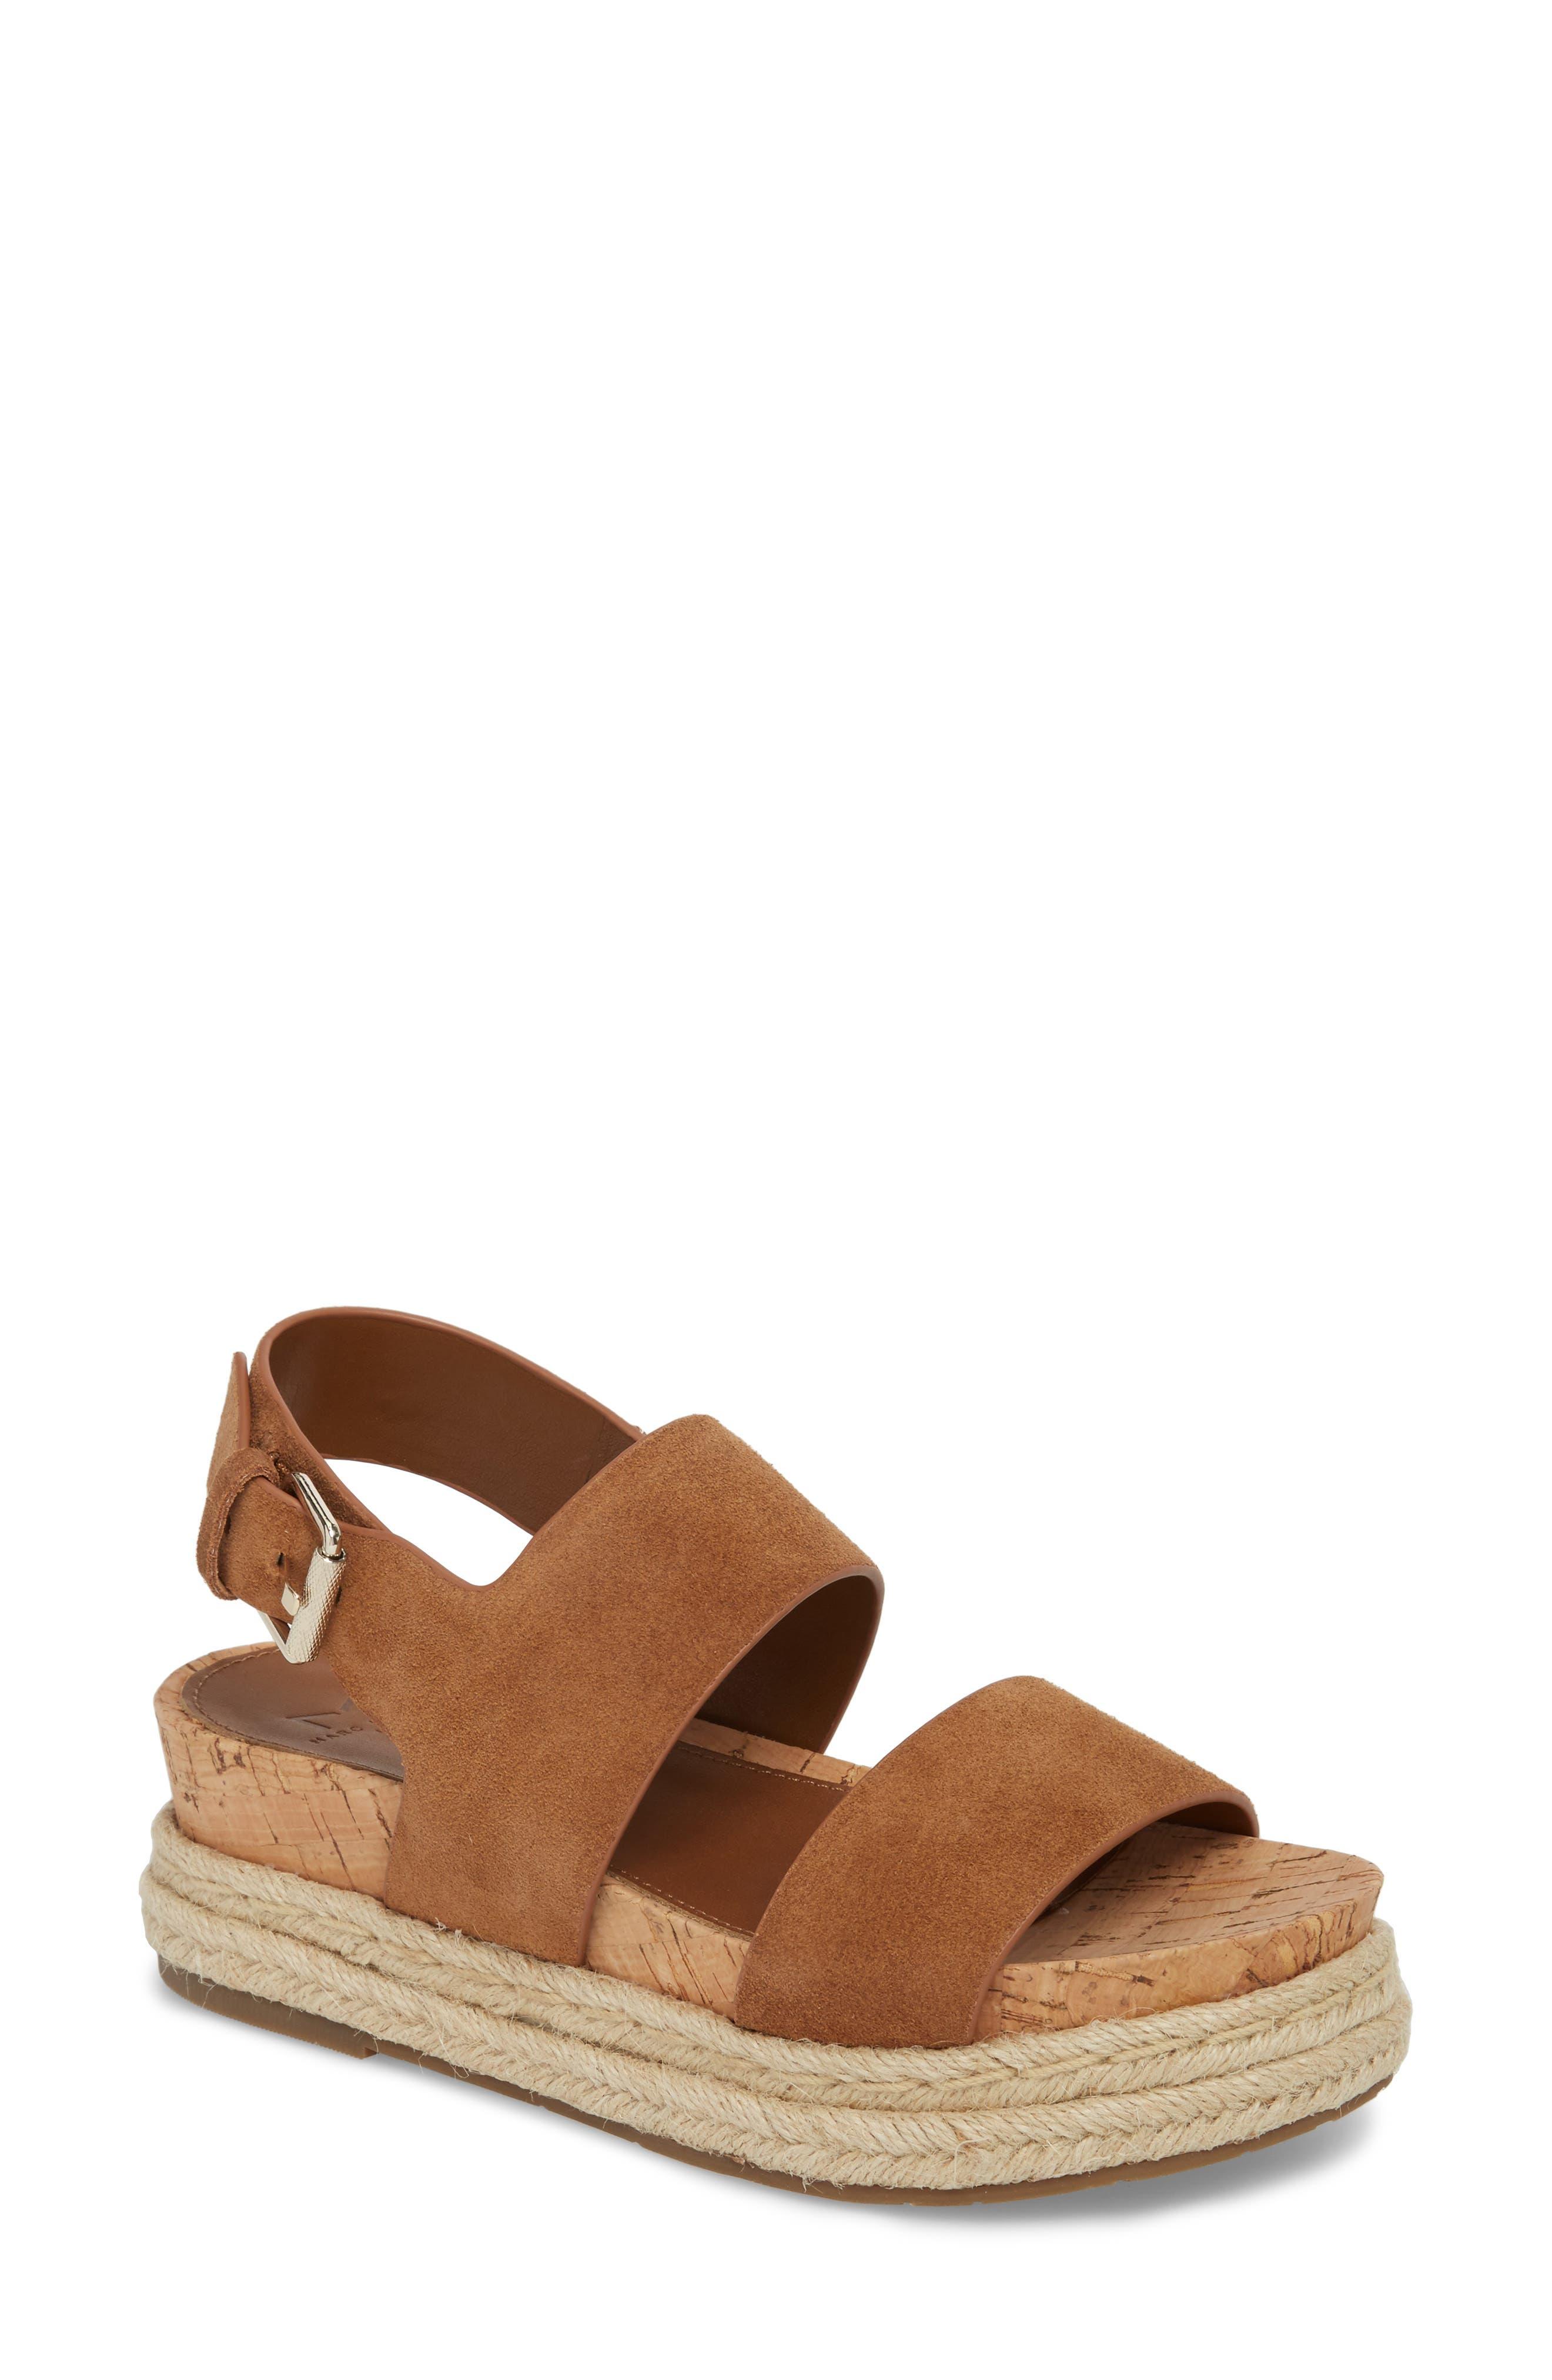 3325a51c48ec Women s Marc Fisher LTD Platform Sandals  Wedge